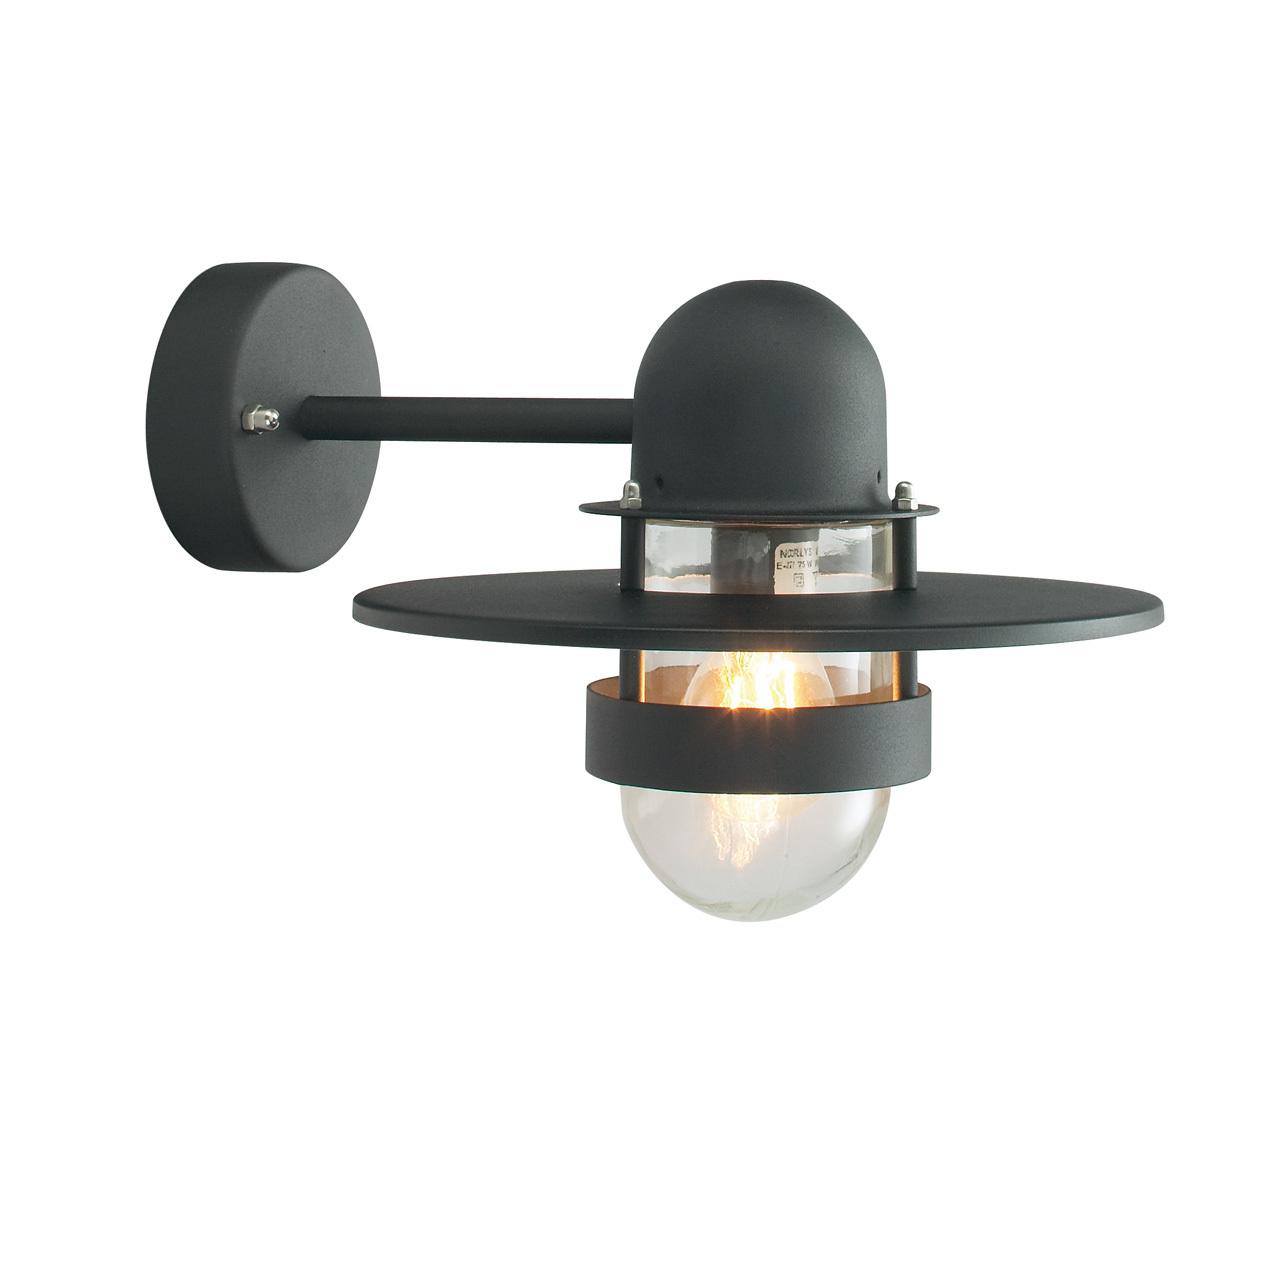 Lampa ścienna BERGEN 270B -Norlys